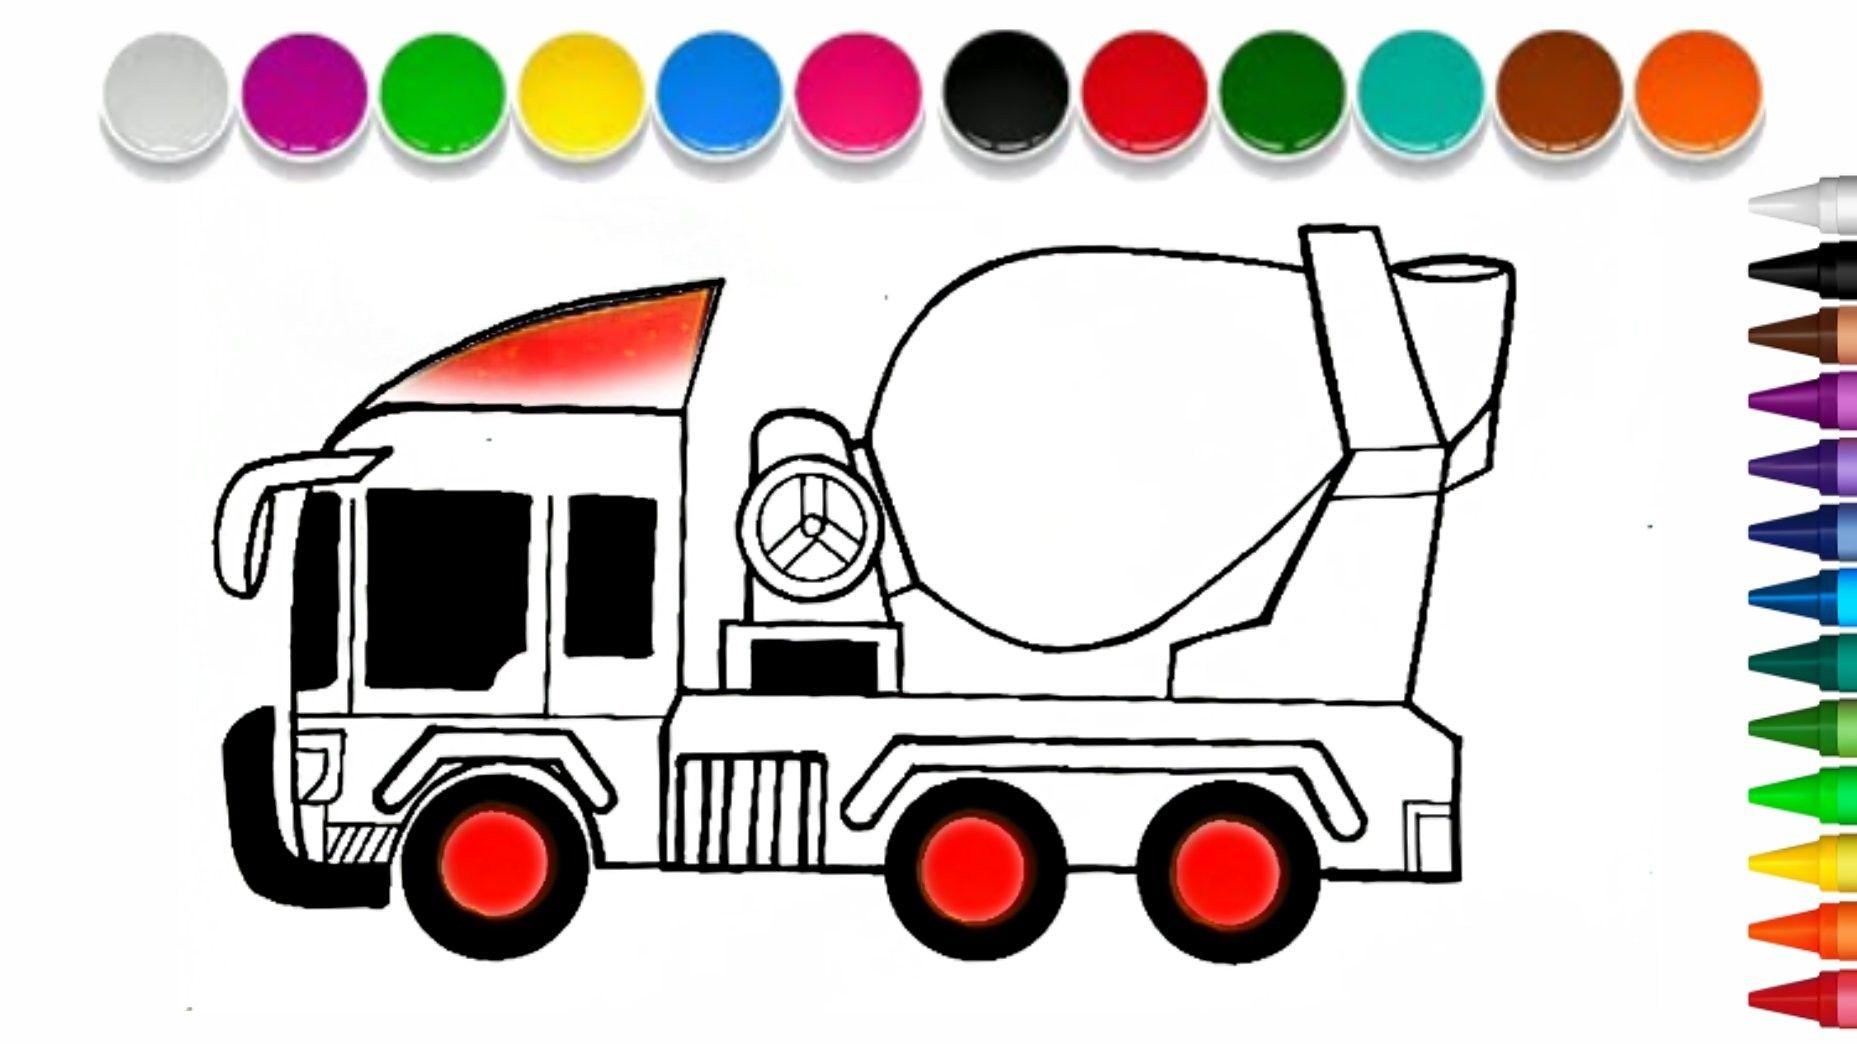 Cara Menggambar Mobil Truk Molen Mudah Untuk Anak Cara Menggambar Truk Belajar Menggambar